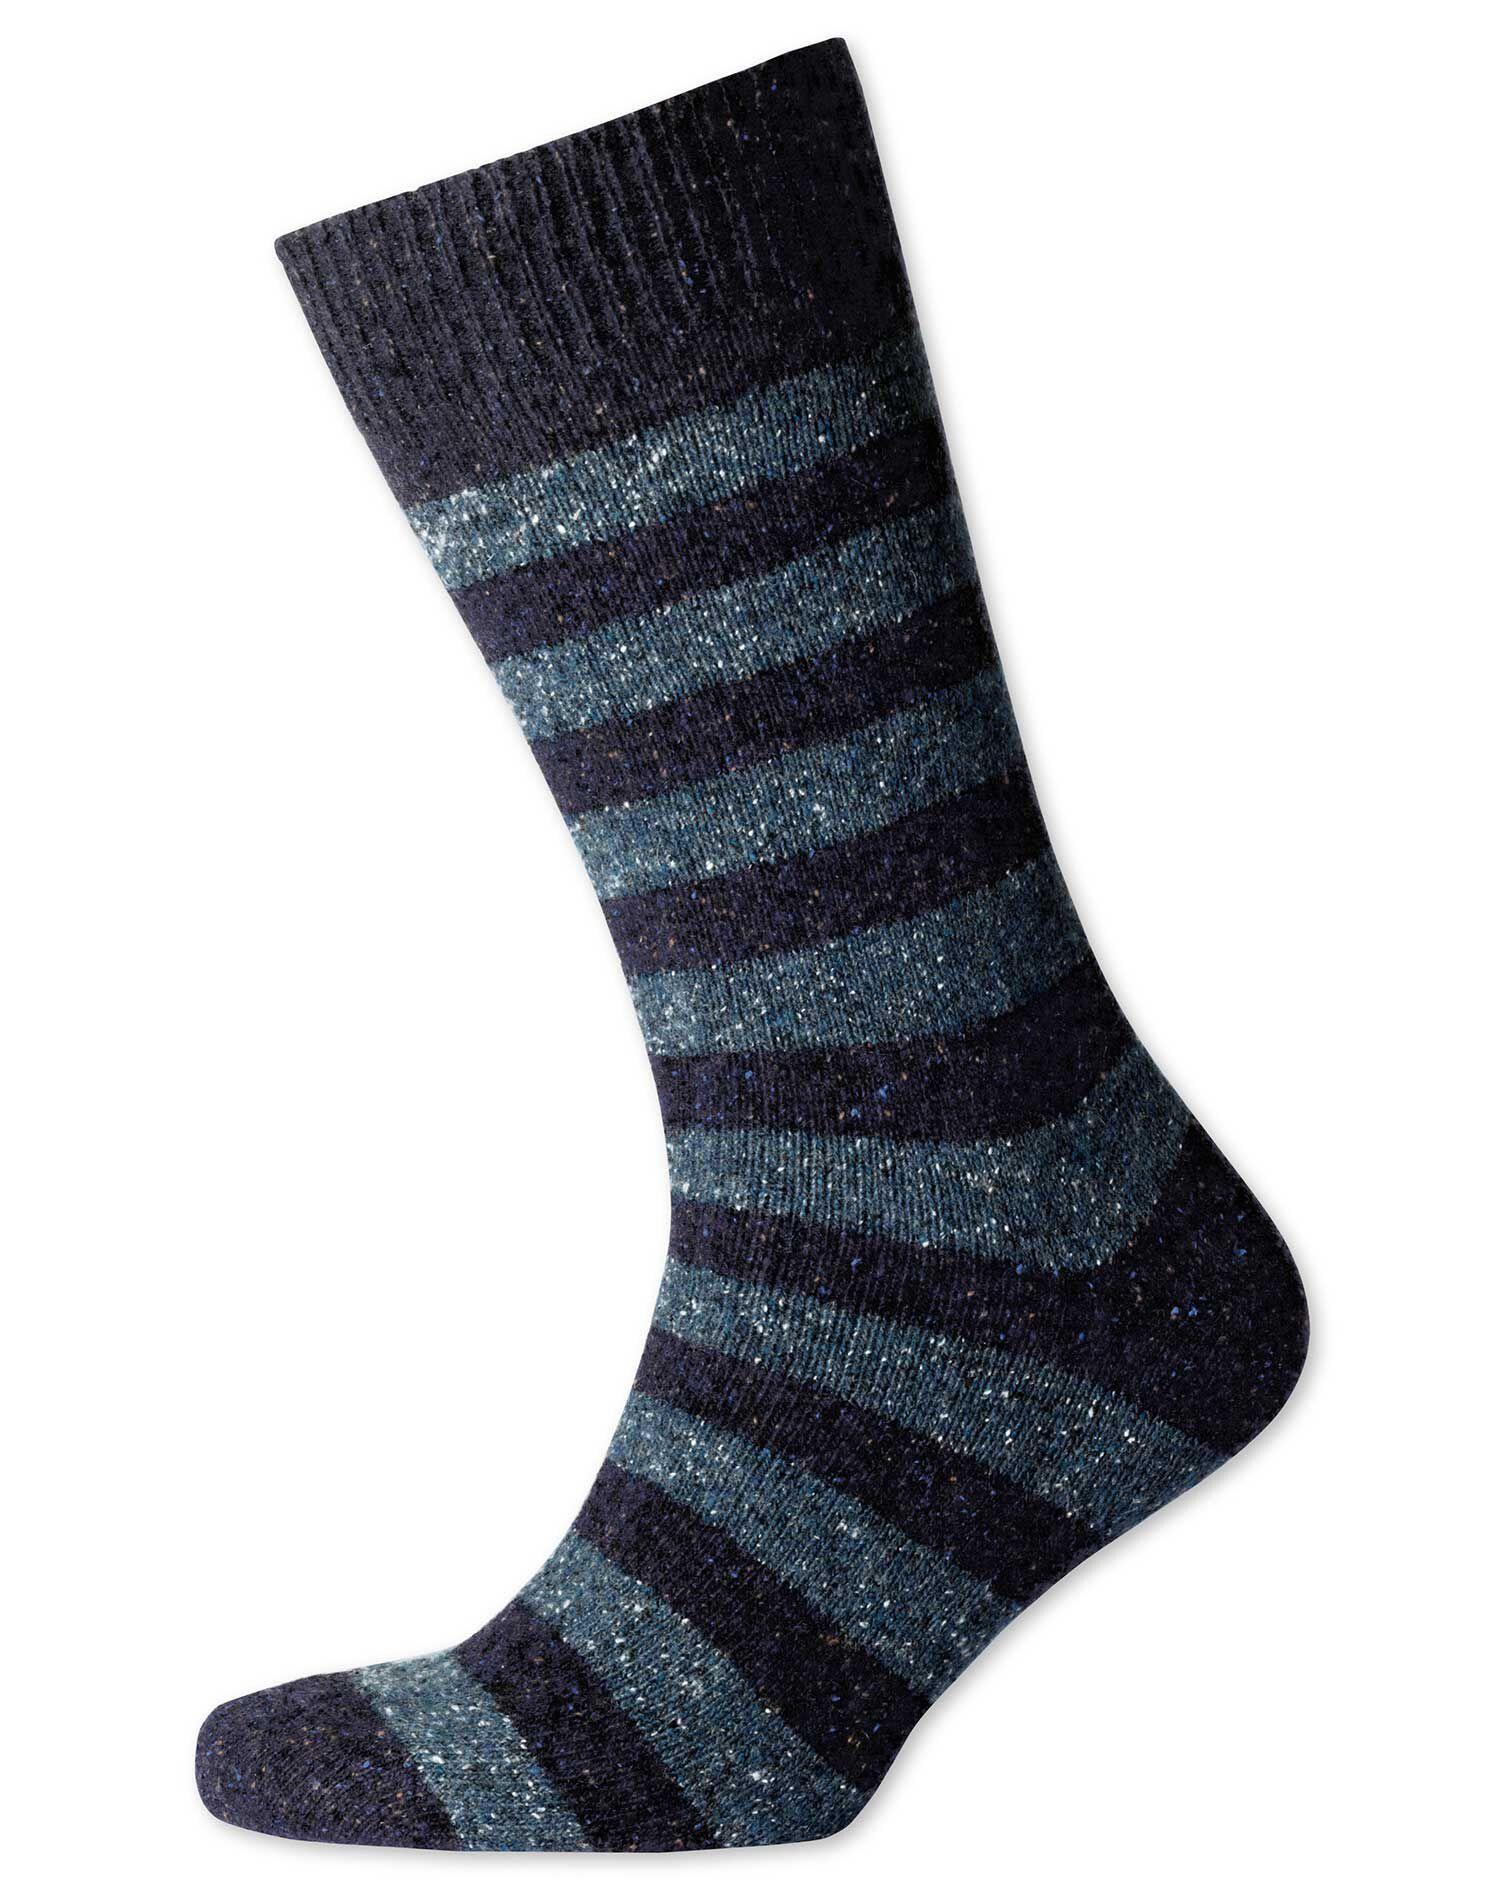 Navy and Sky Stripe Chunky Socks Size Medium by Charles Tyrwhitt